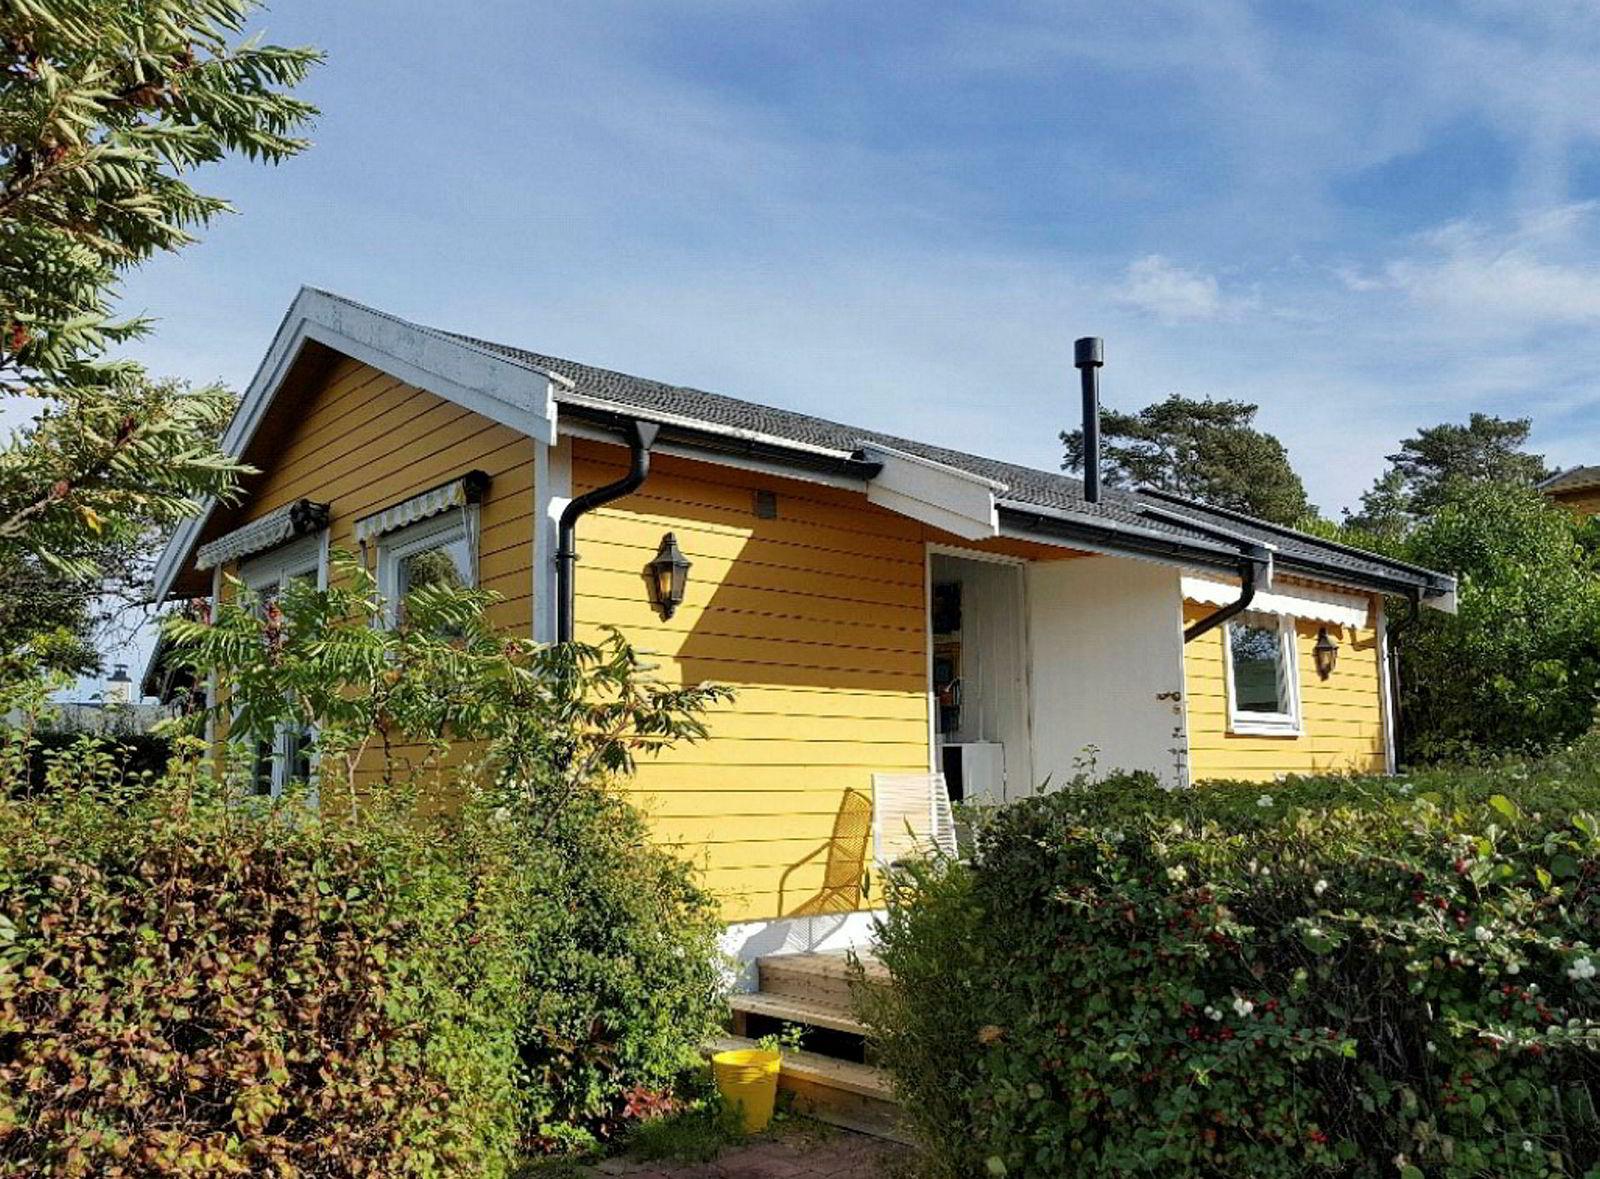 Småhytta på Lindøya ble solgt for 6,5 millioner kroner off market i september 2018.